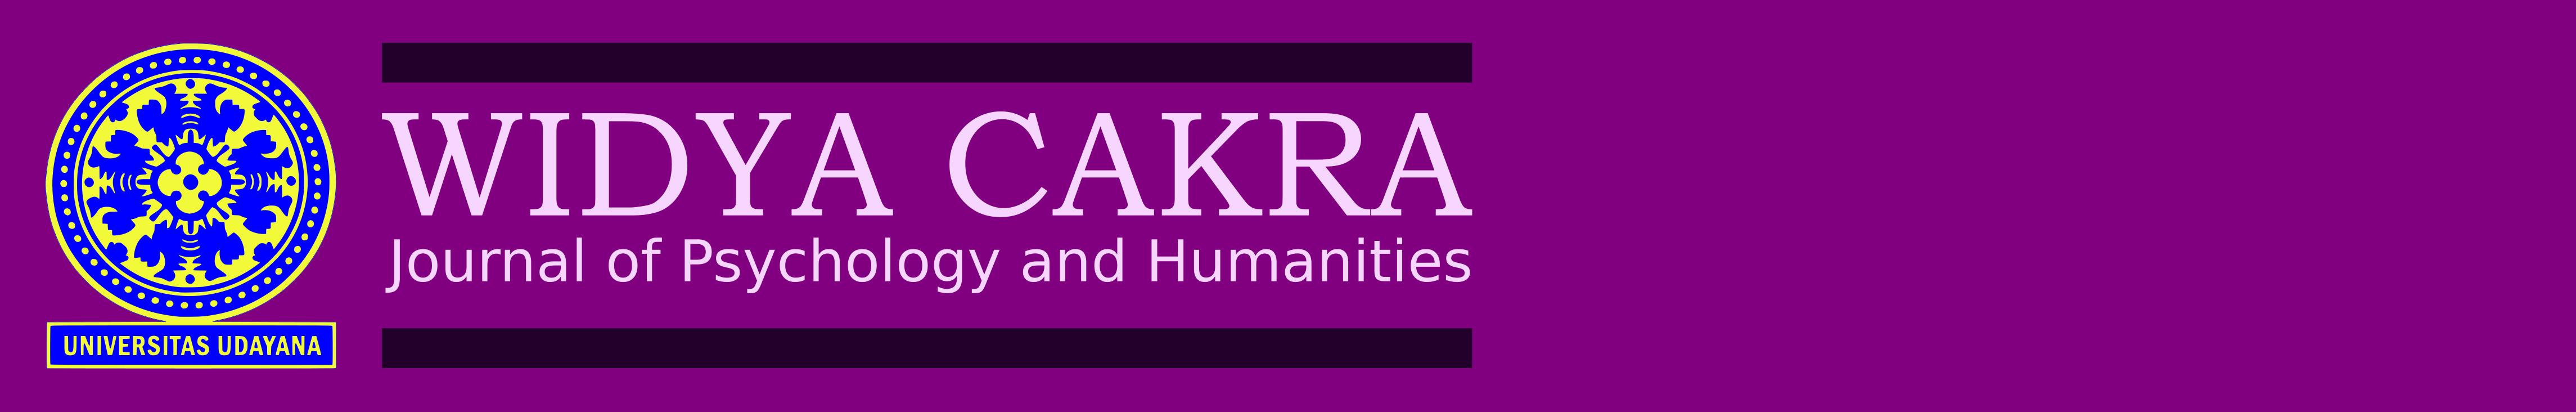 LogoWidyaCakra_UNUD_2020